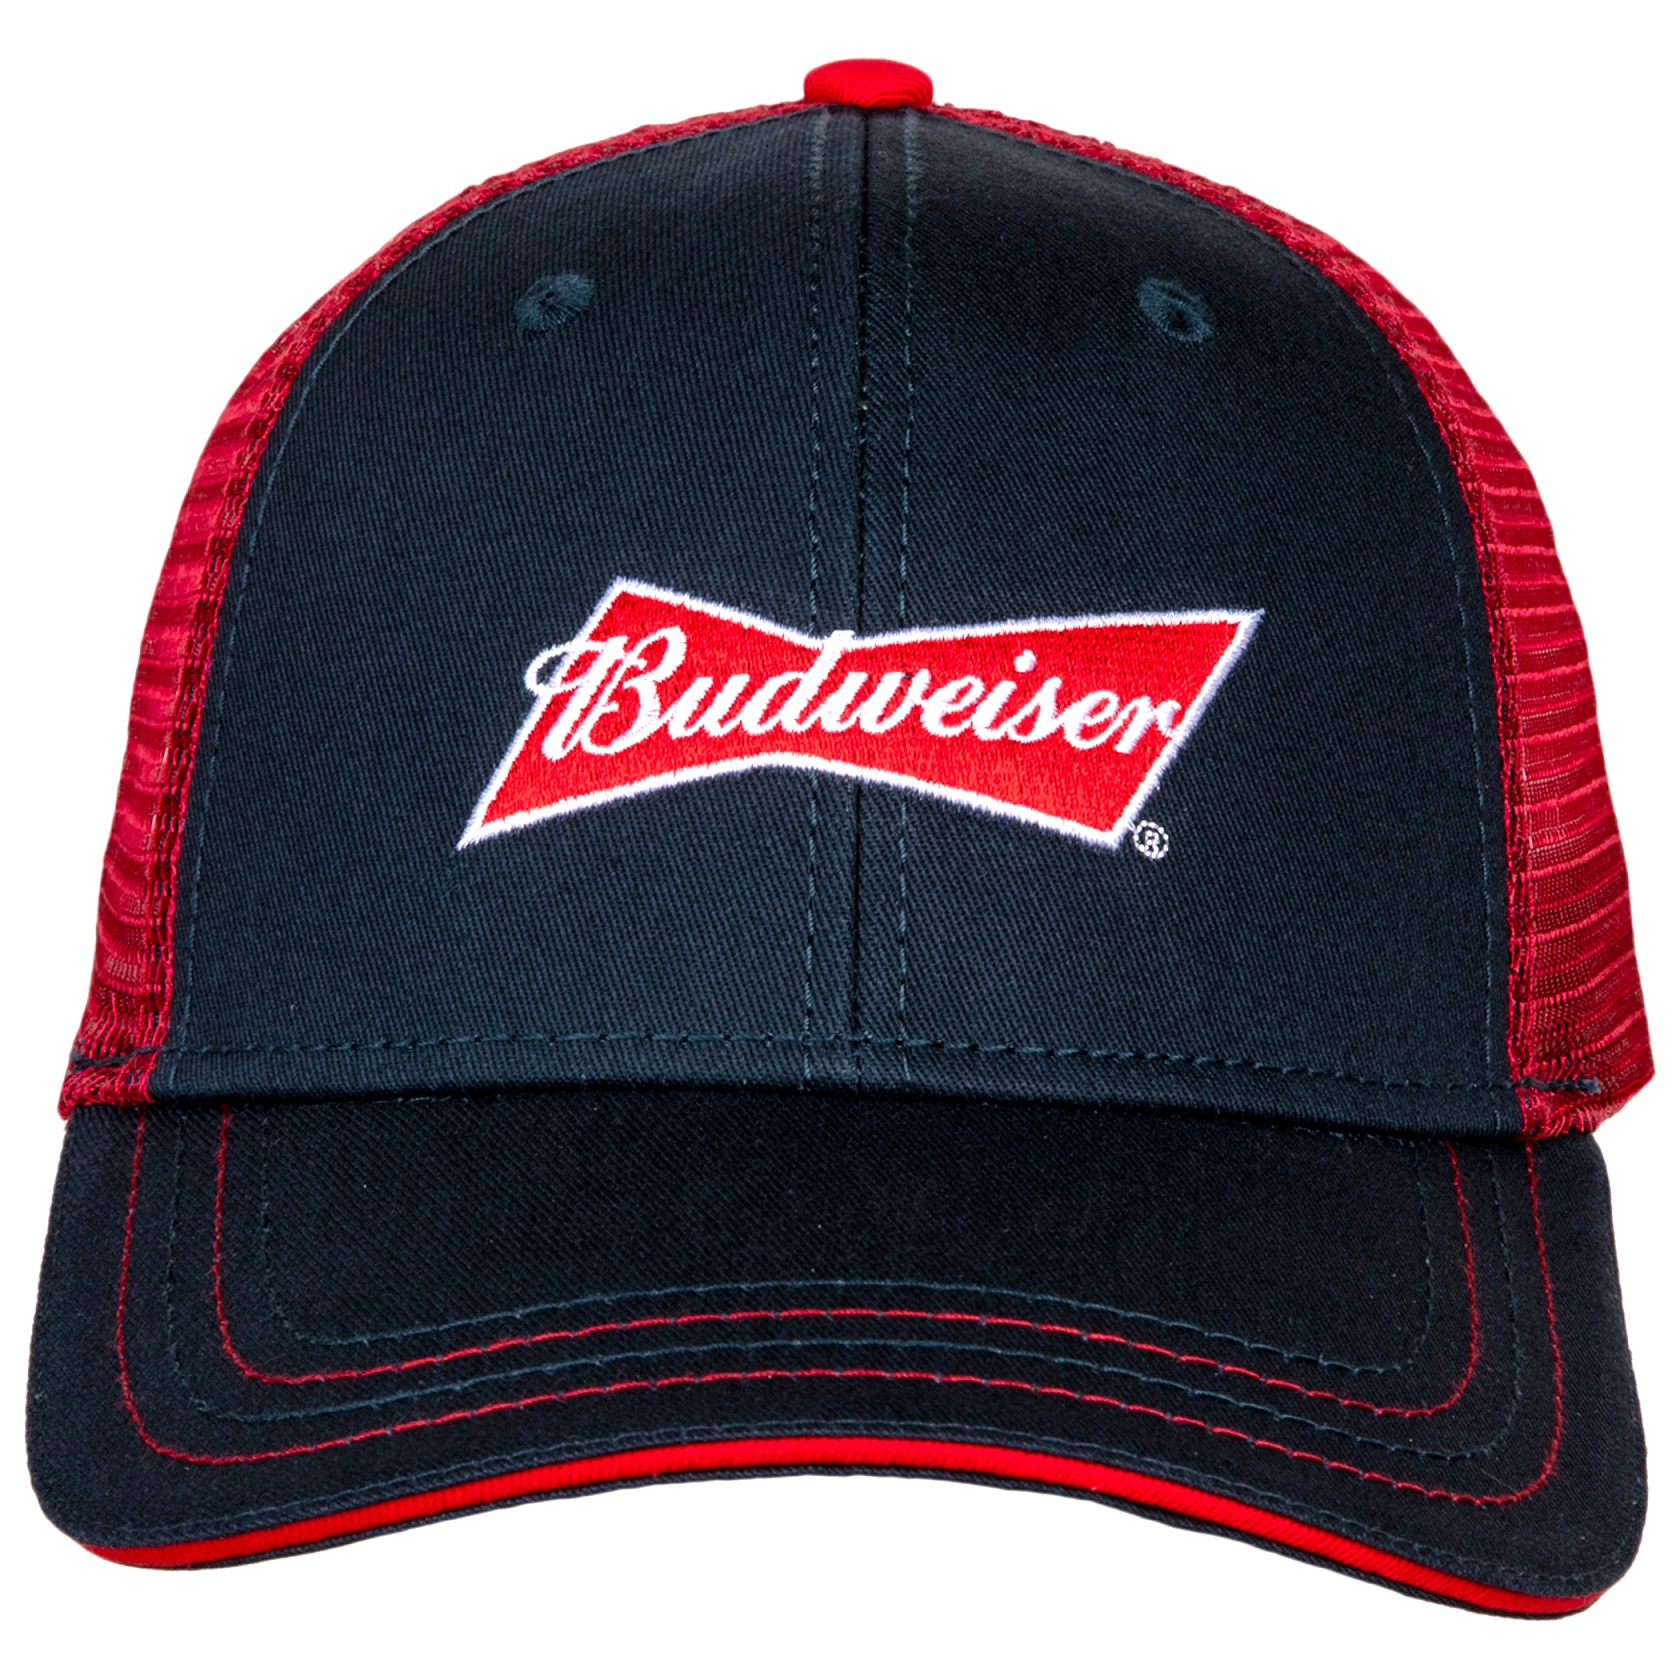 Budweiser Logo Adjustable Snapback Trucker Hat